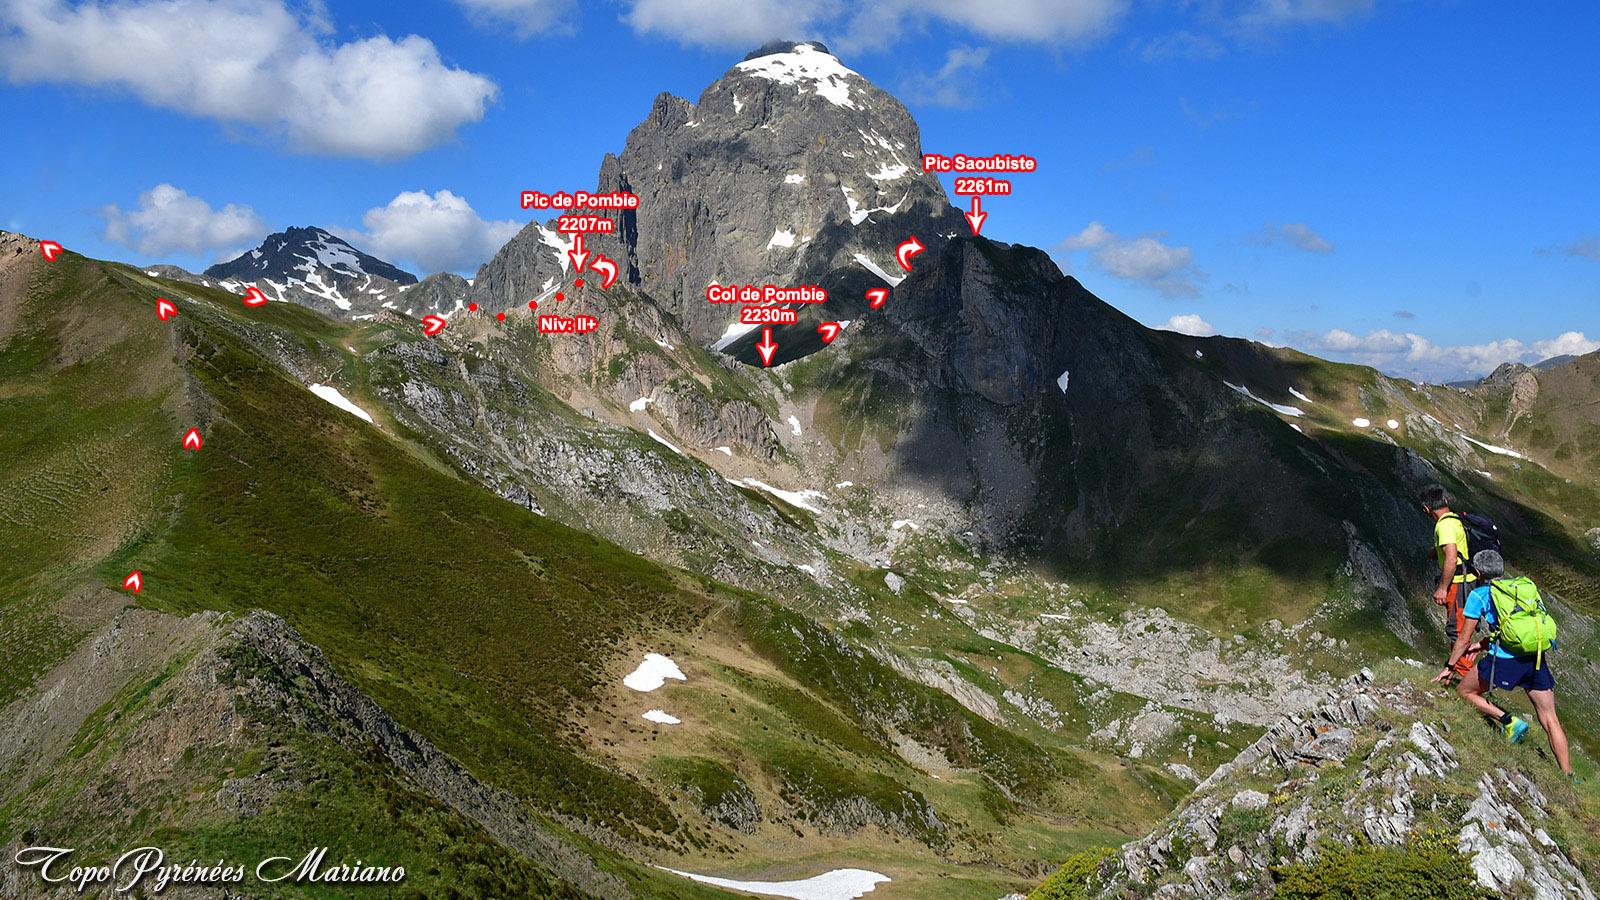 Randonnée au Pic Saoubiste (2261m)